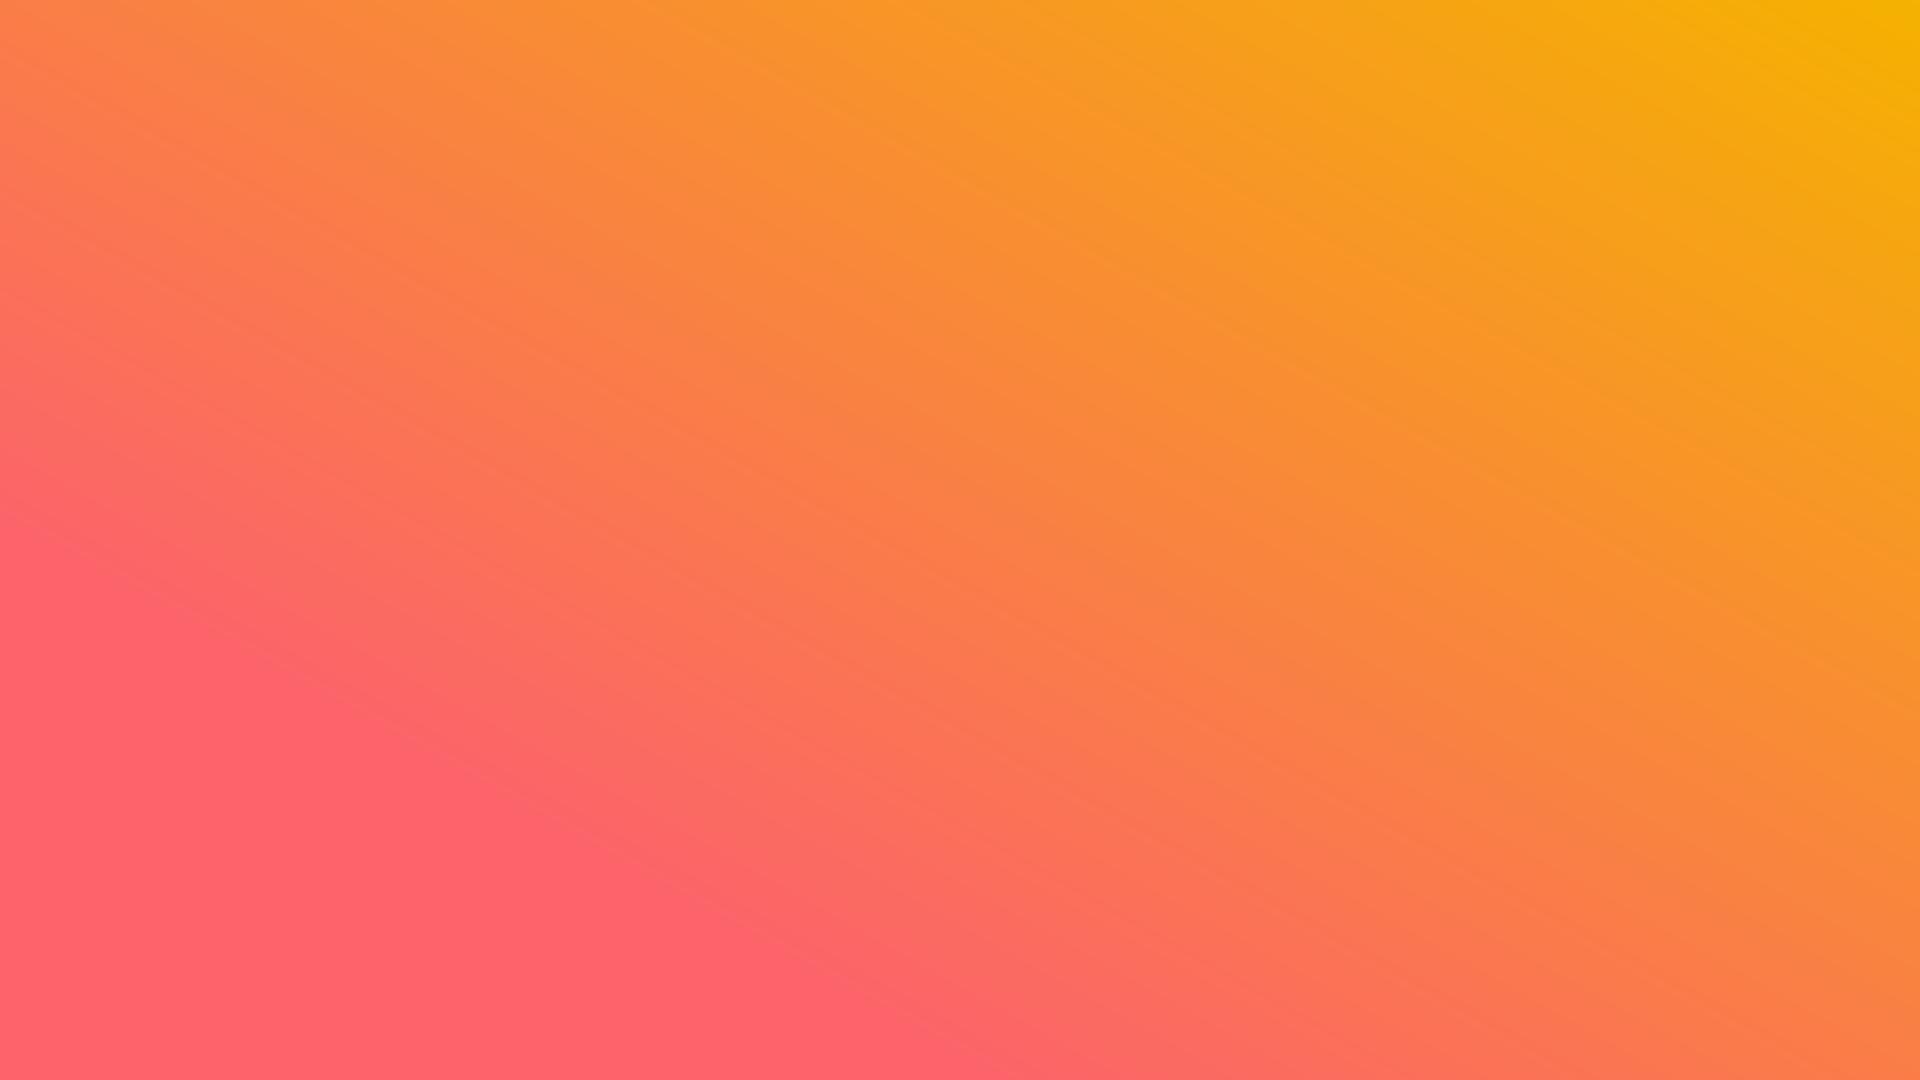 Asana Color Gradient Gradient